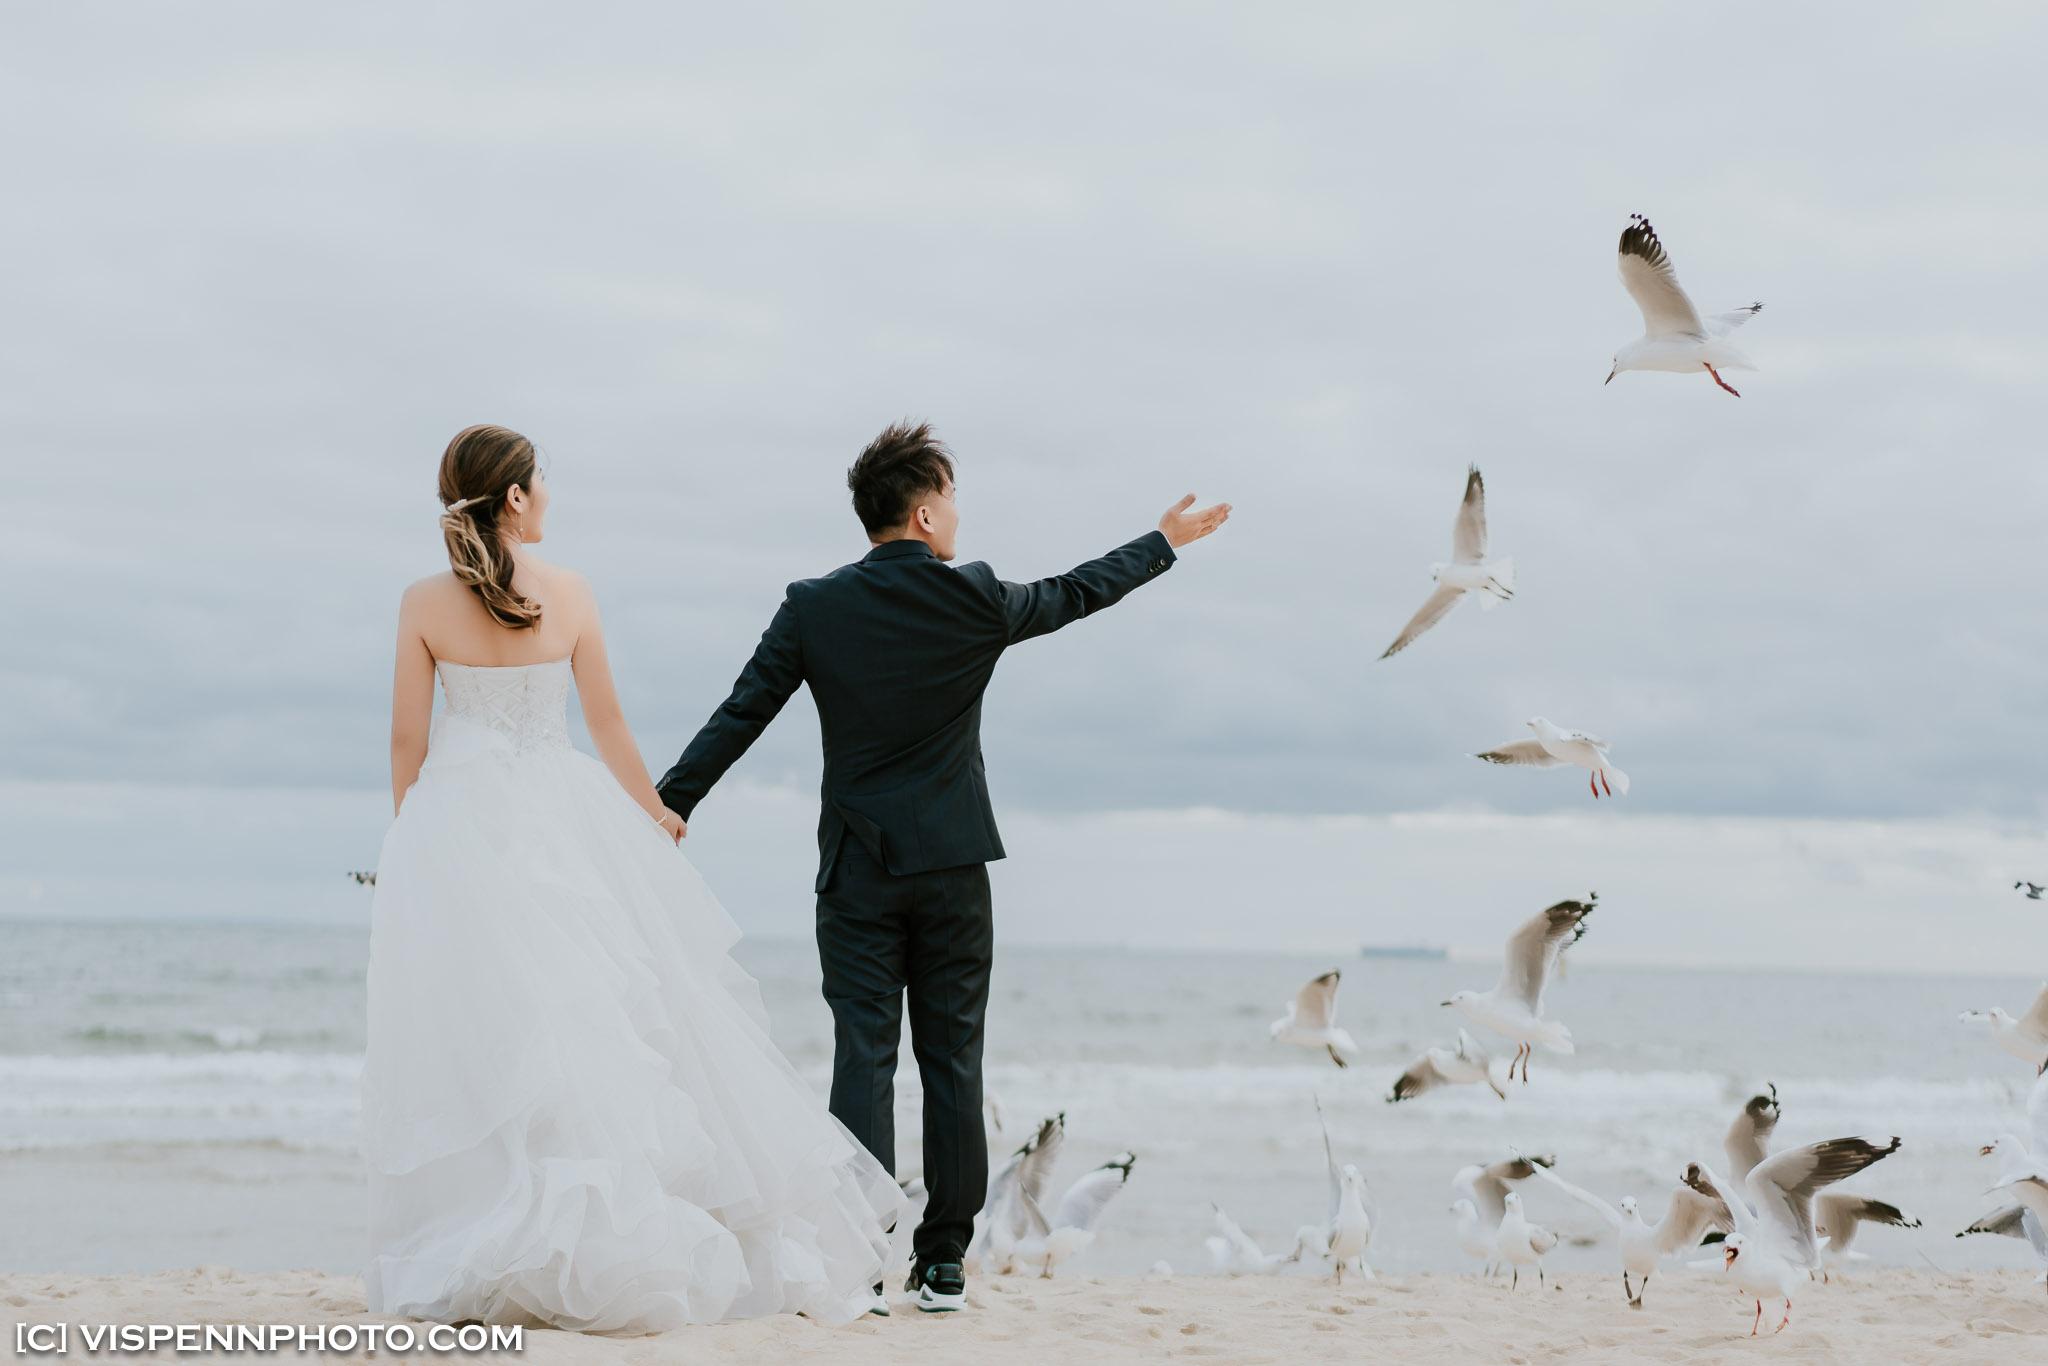 PRE WEDDING Photography Melbourne VISPENN 墨尔本 婚纱照 结婚照 婚纱摄影 GiGi 3204 A7R3 VISPENN